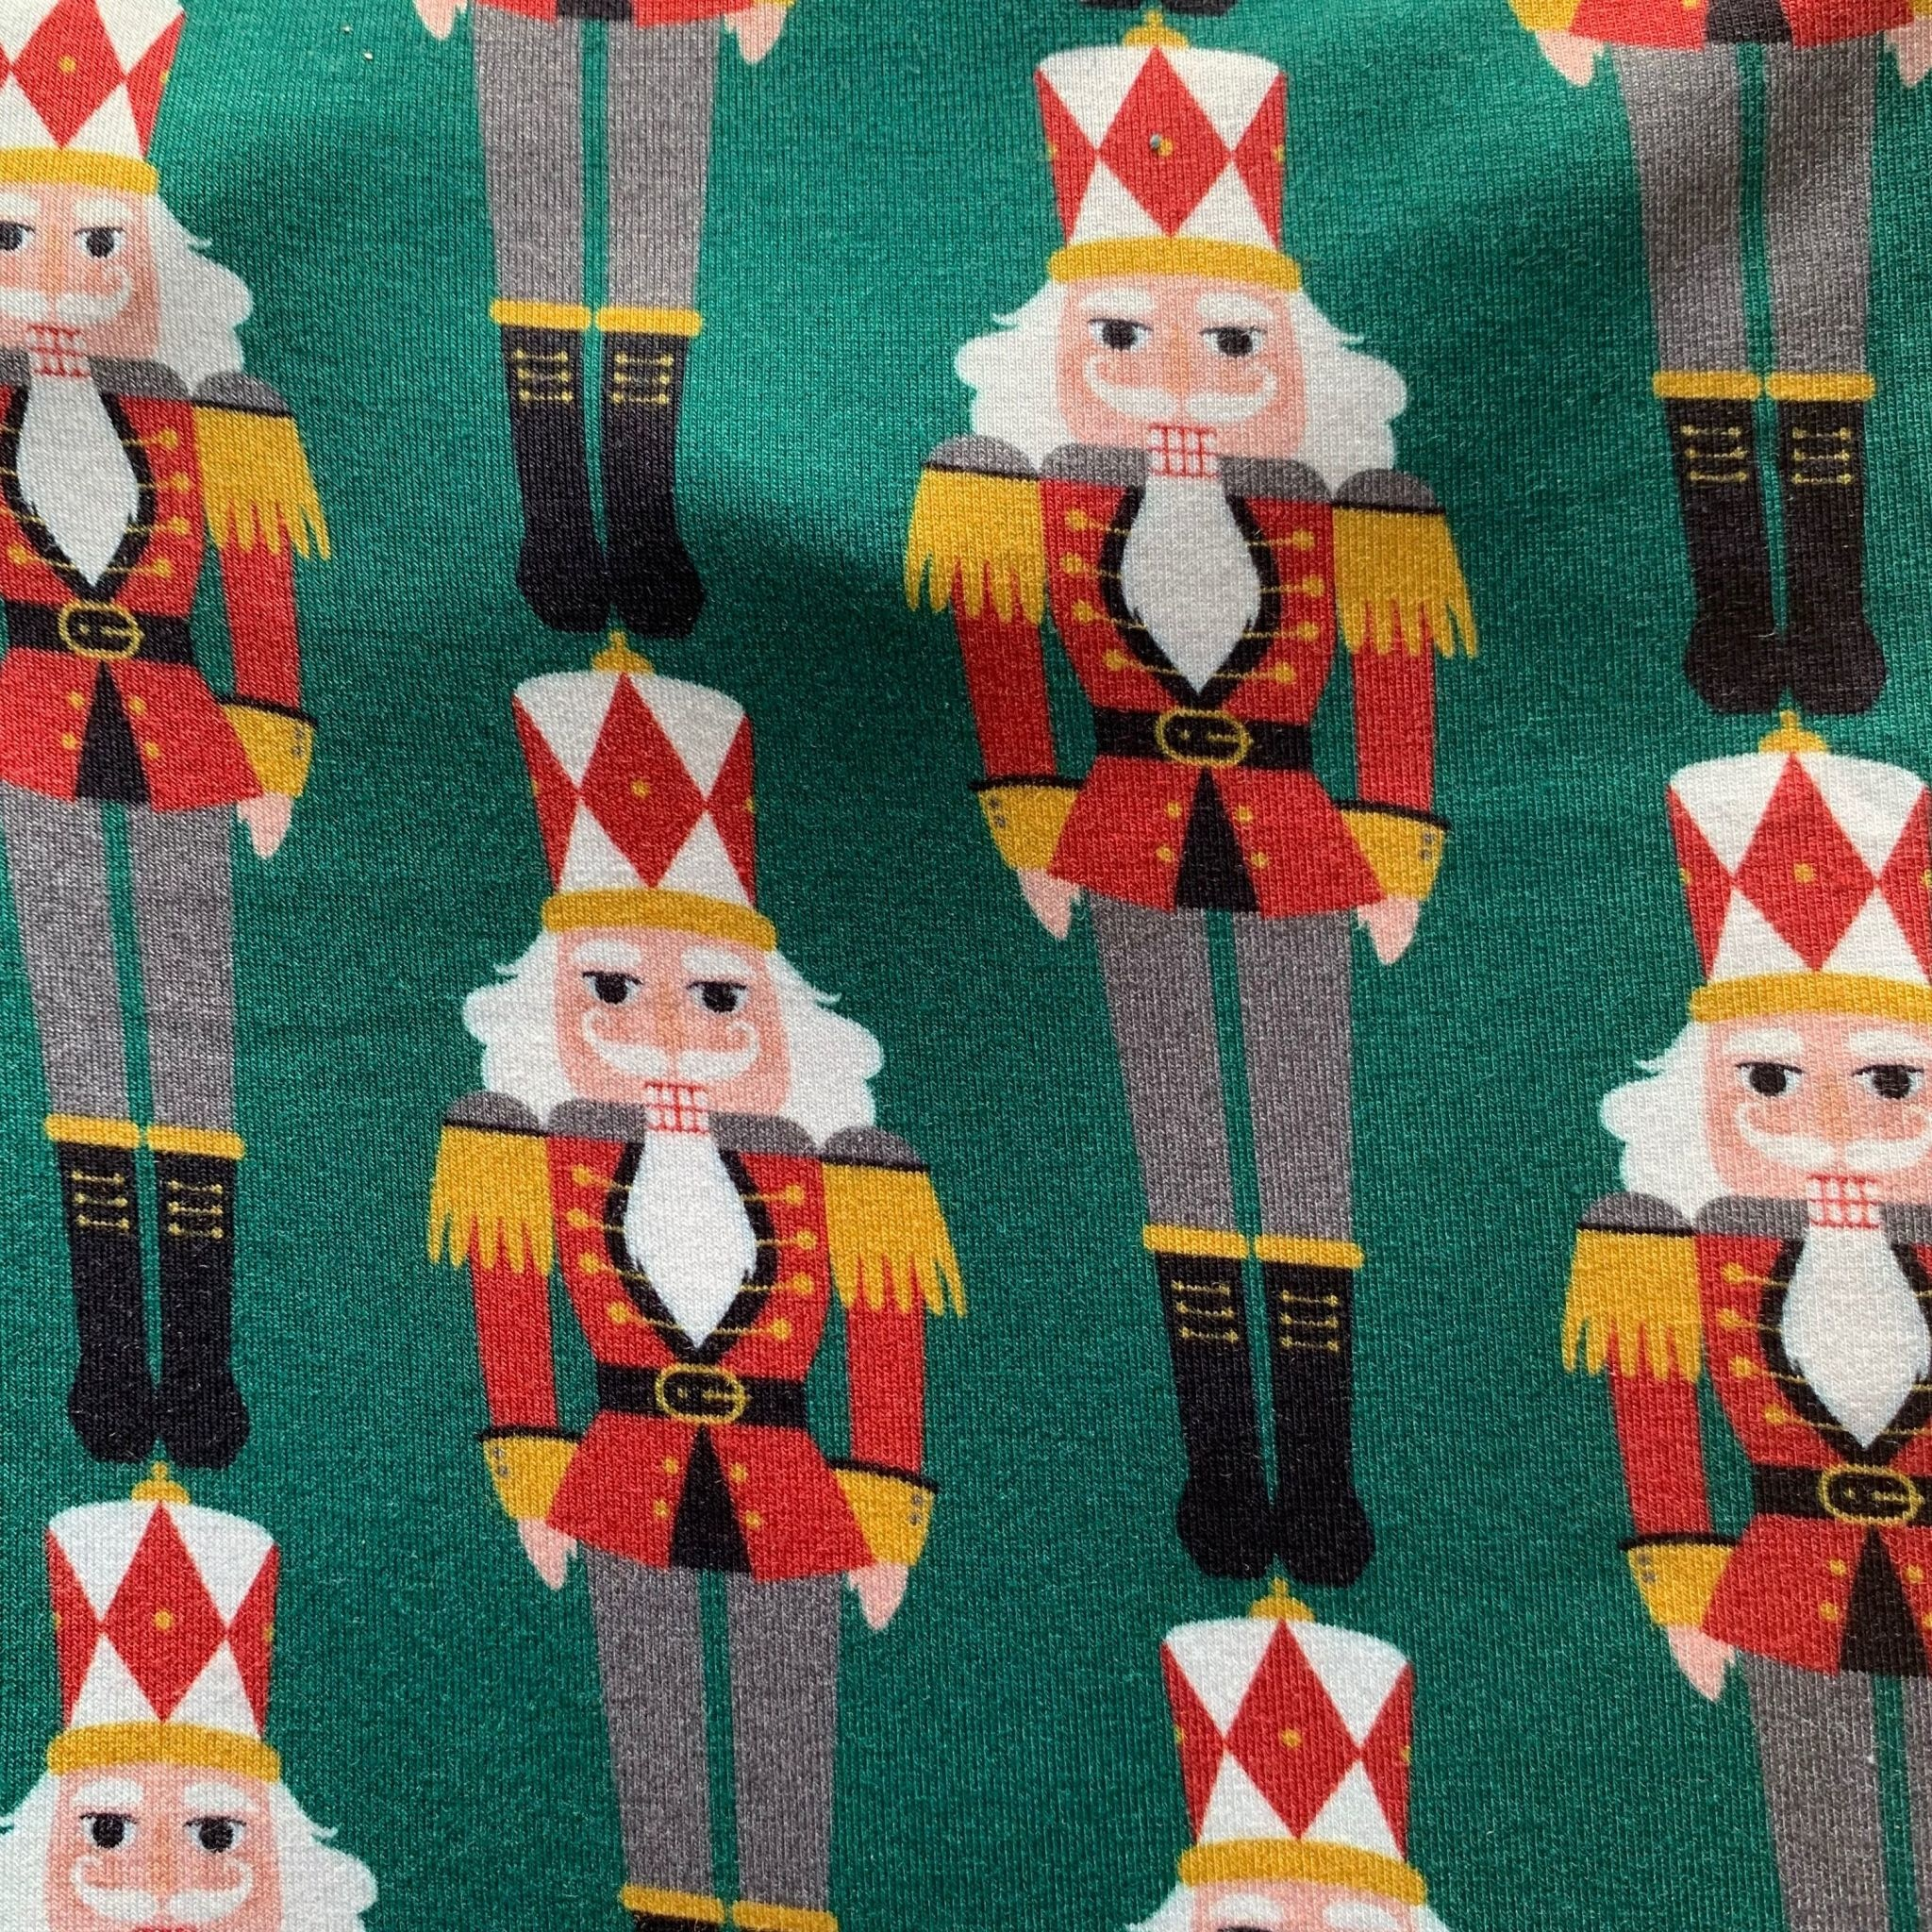 Kozi & Co Nutcracker Pajama Set